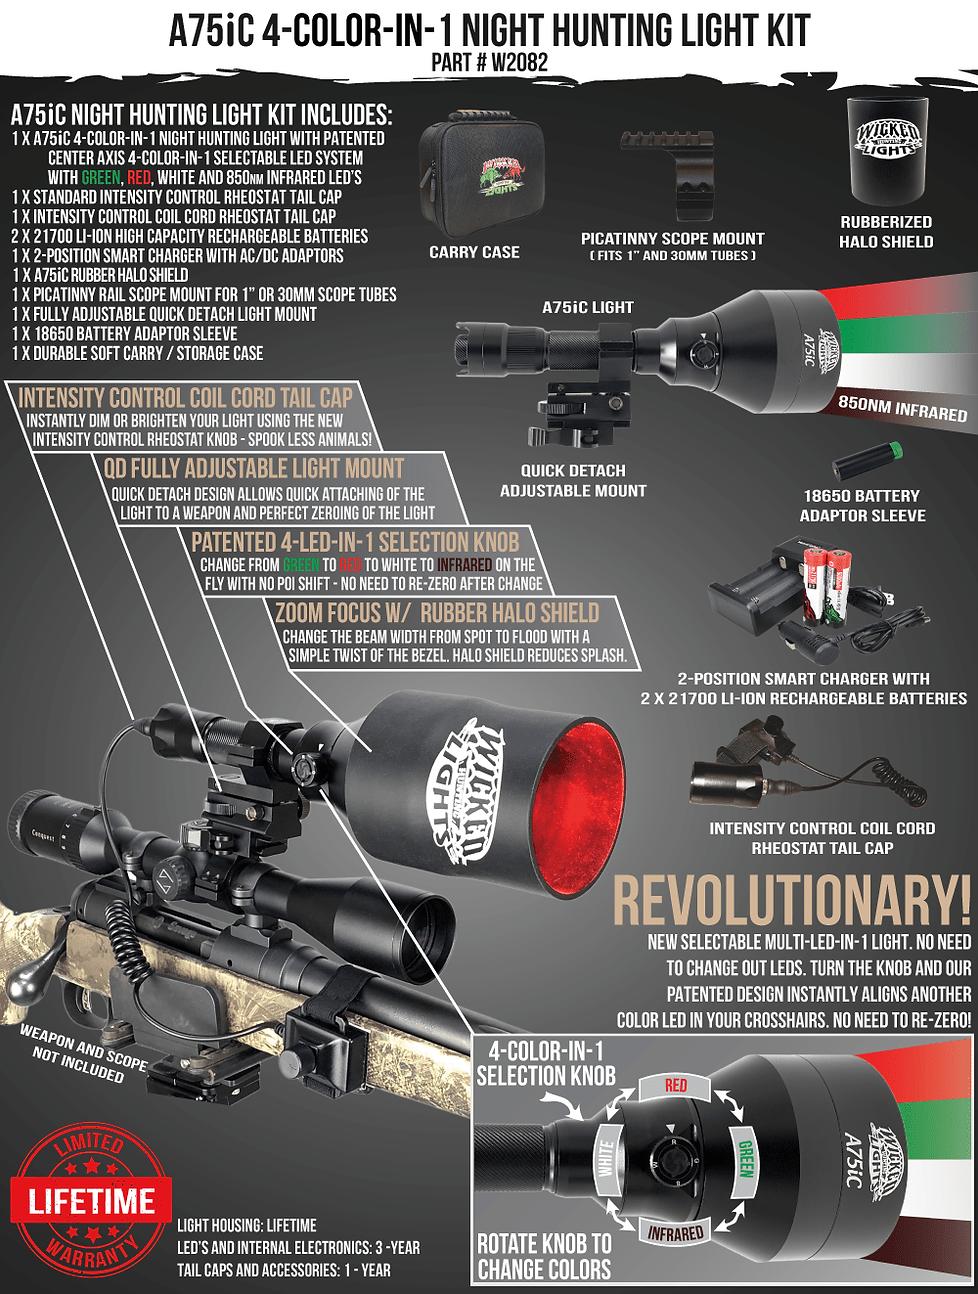 A75iC-Gun-Light-Kit-Contents-min.png